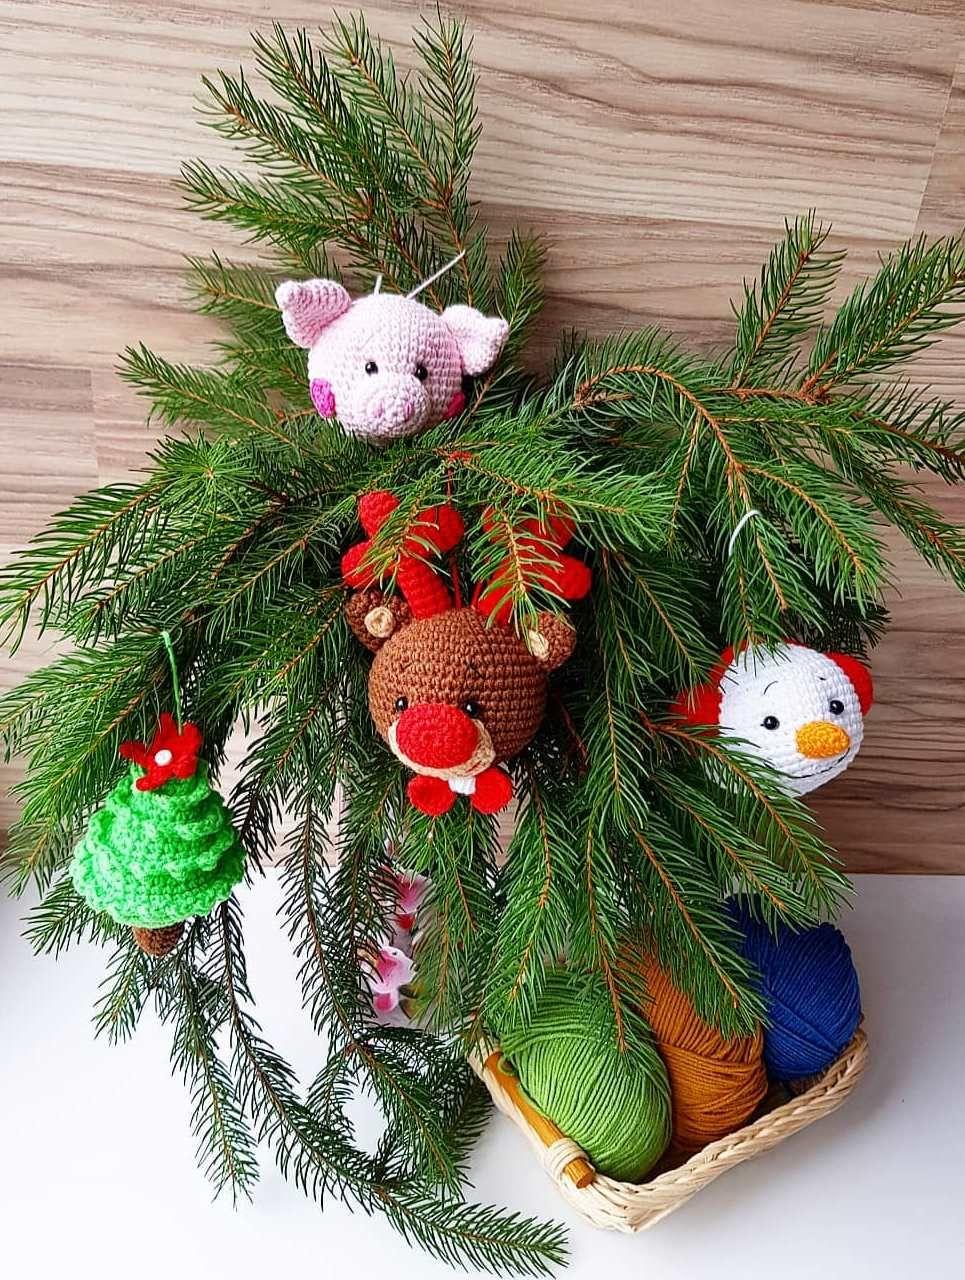 игрушки на елку крючком схемыамигуруми амигуруми вязаныеигрушки